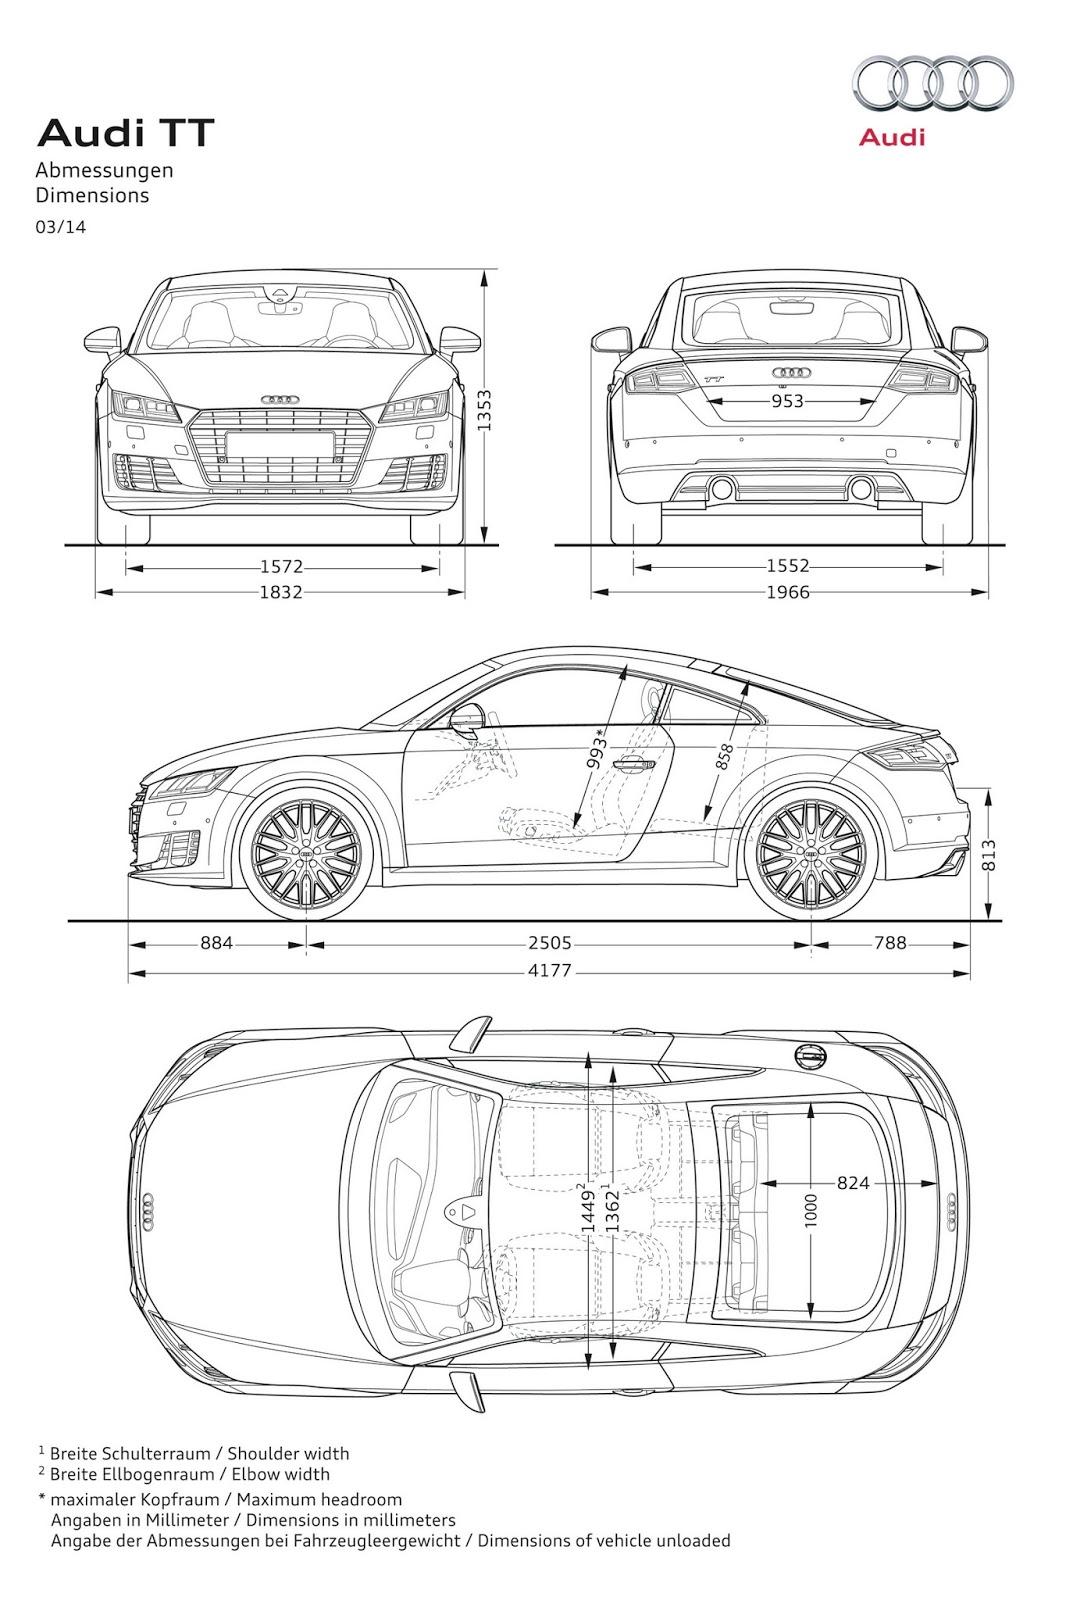 Audi S New Tt And Tts Make Geneva Debut 85 Photos